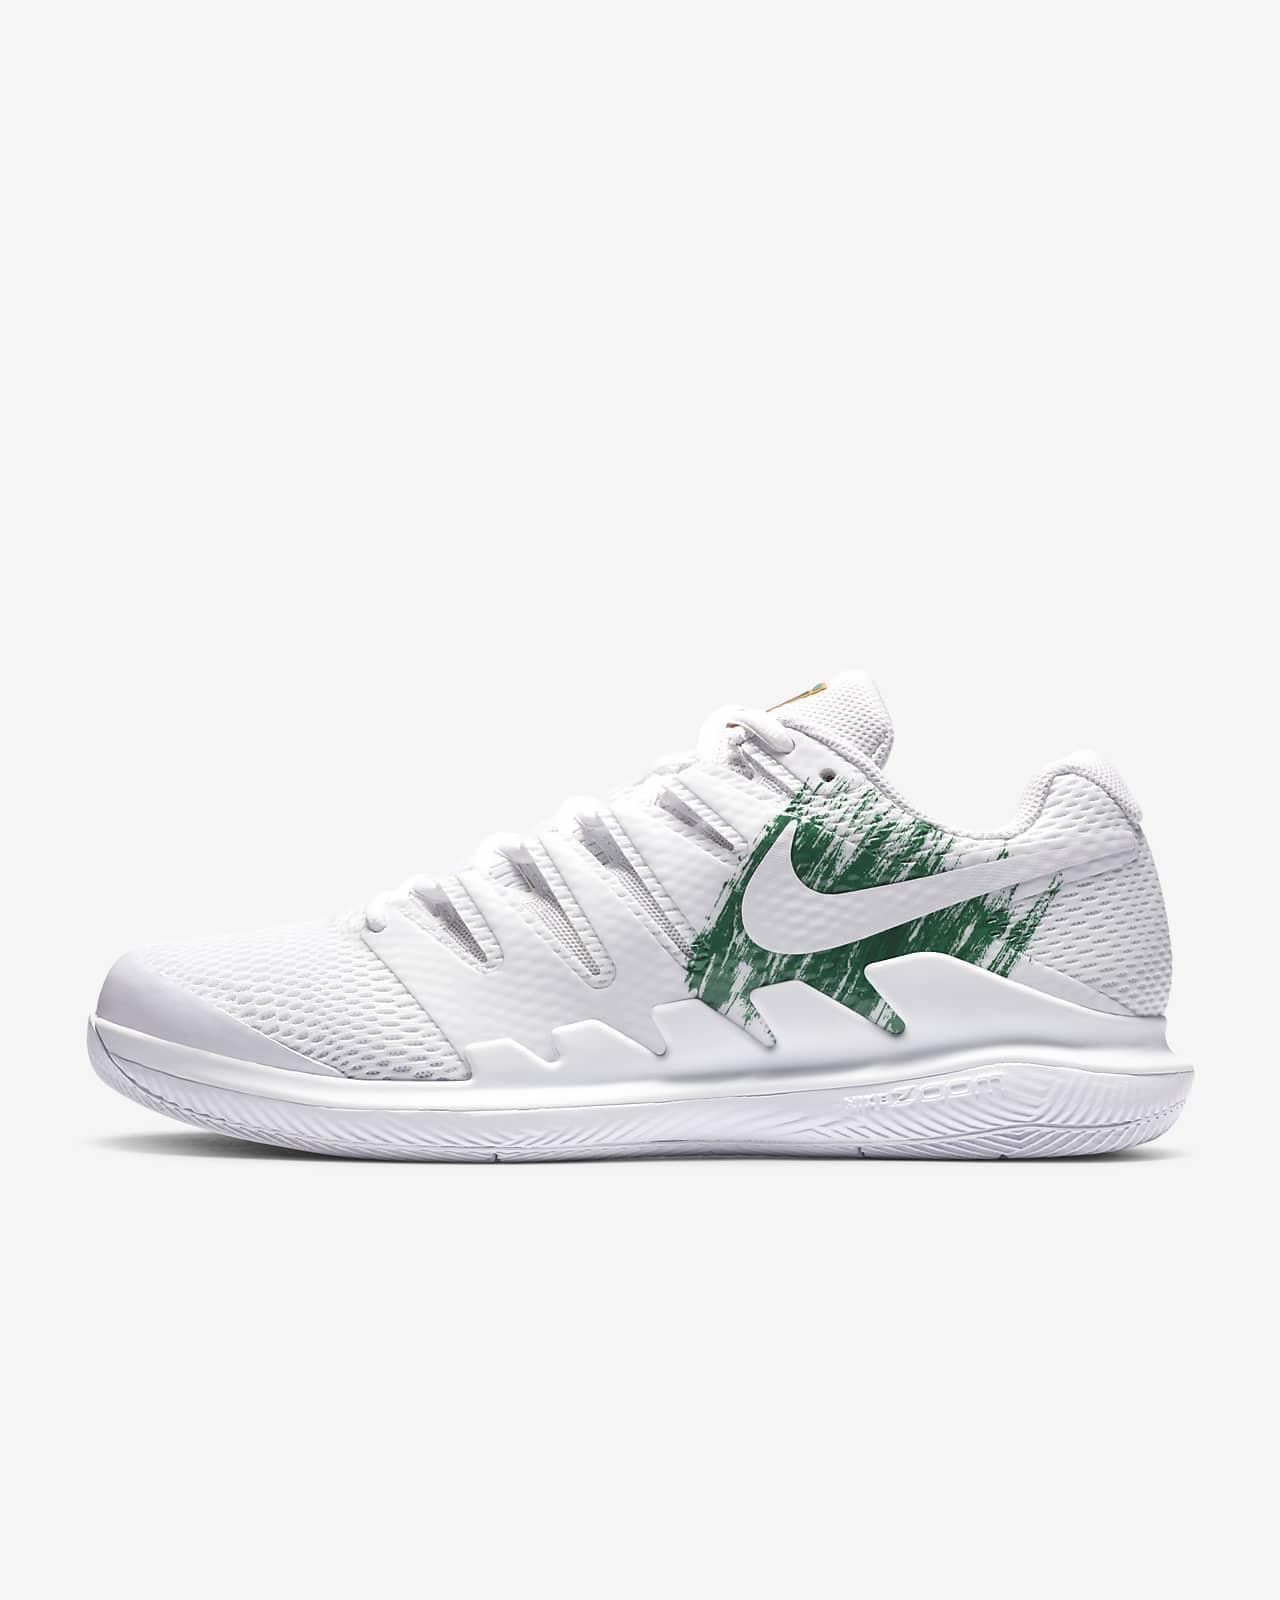 Nikecourt Air Zoom Vapor X Men S Hard Court Tennis Shoe Nike Ie